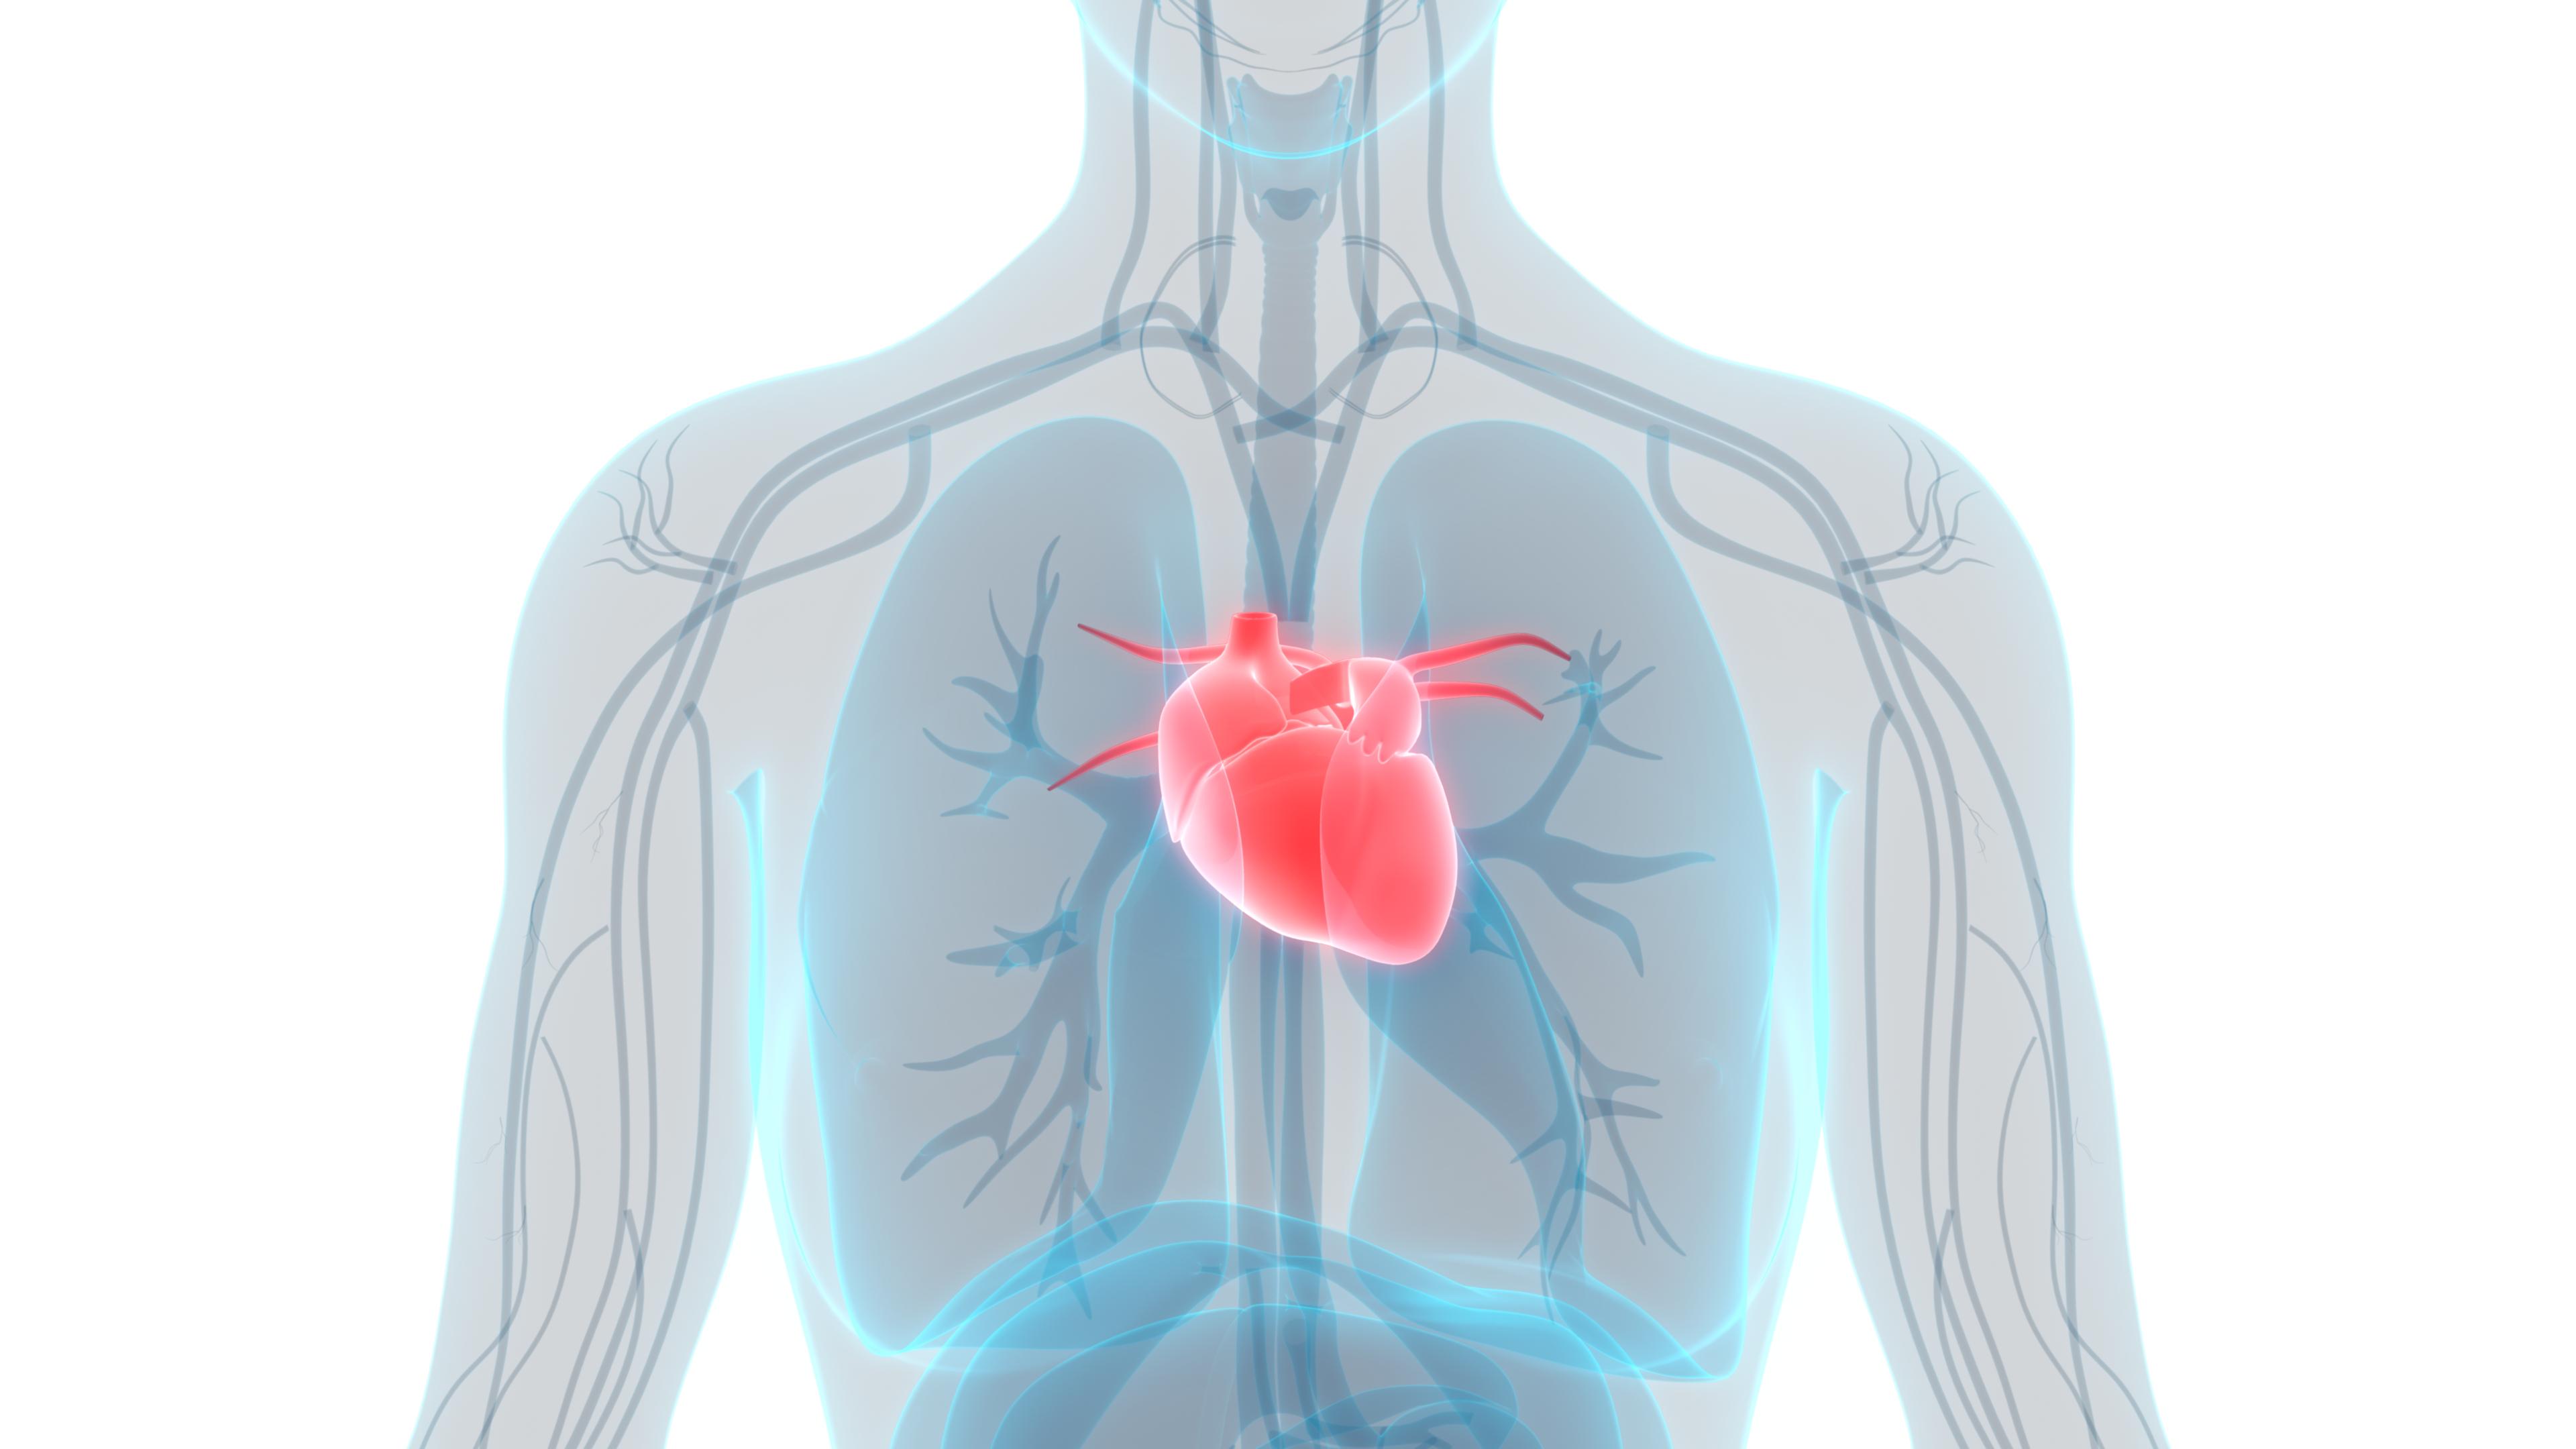 VALIANT: valsartan in acute myocardial infarction trial